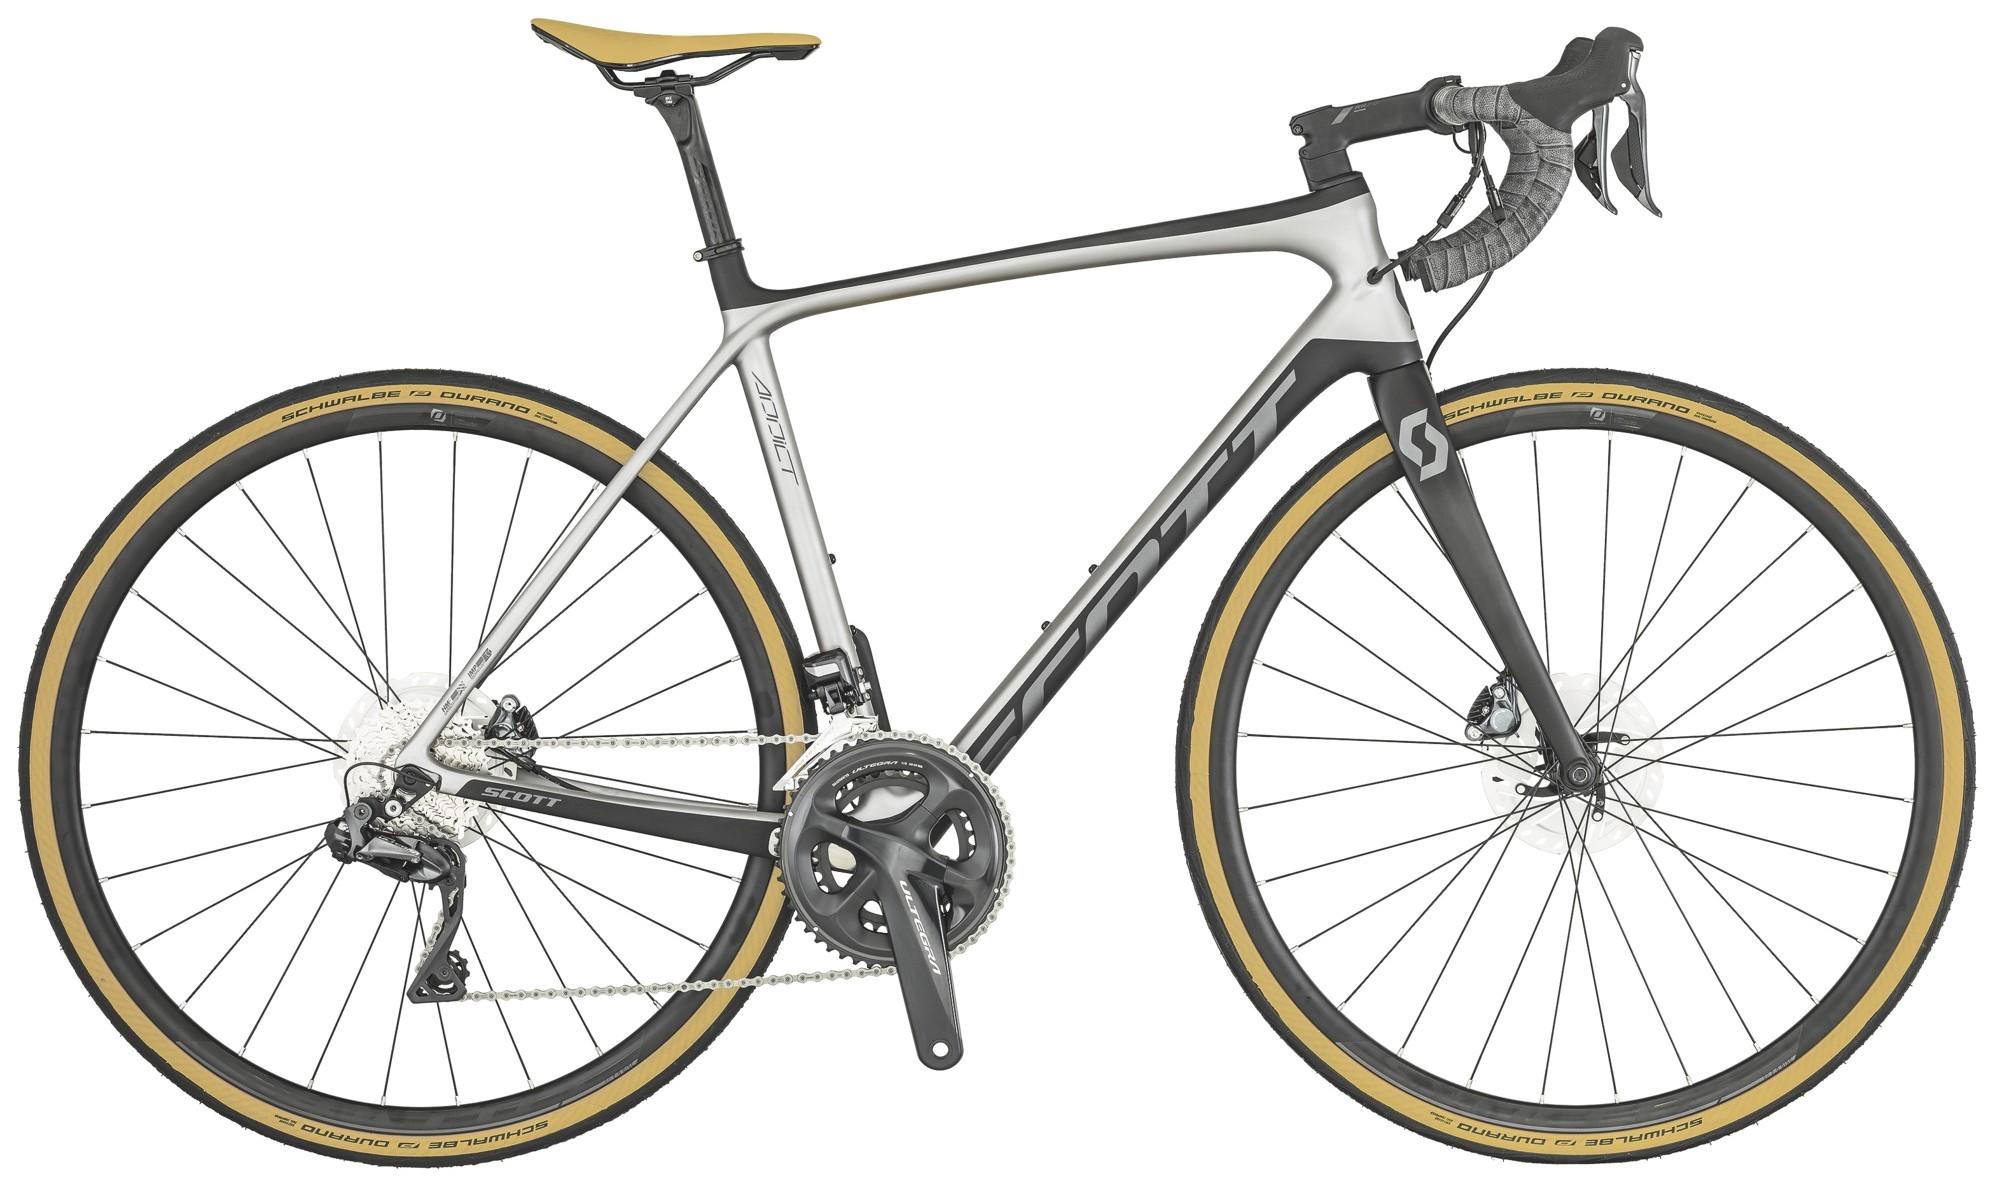 Scott Addict SE Disc Landeveissykkel Karbon, Ultegra Di2 R8050, 8,3 kg